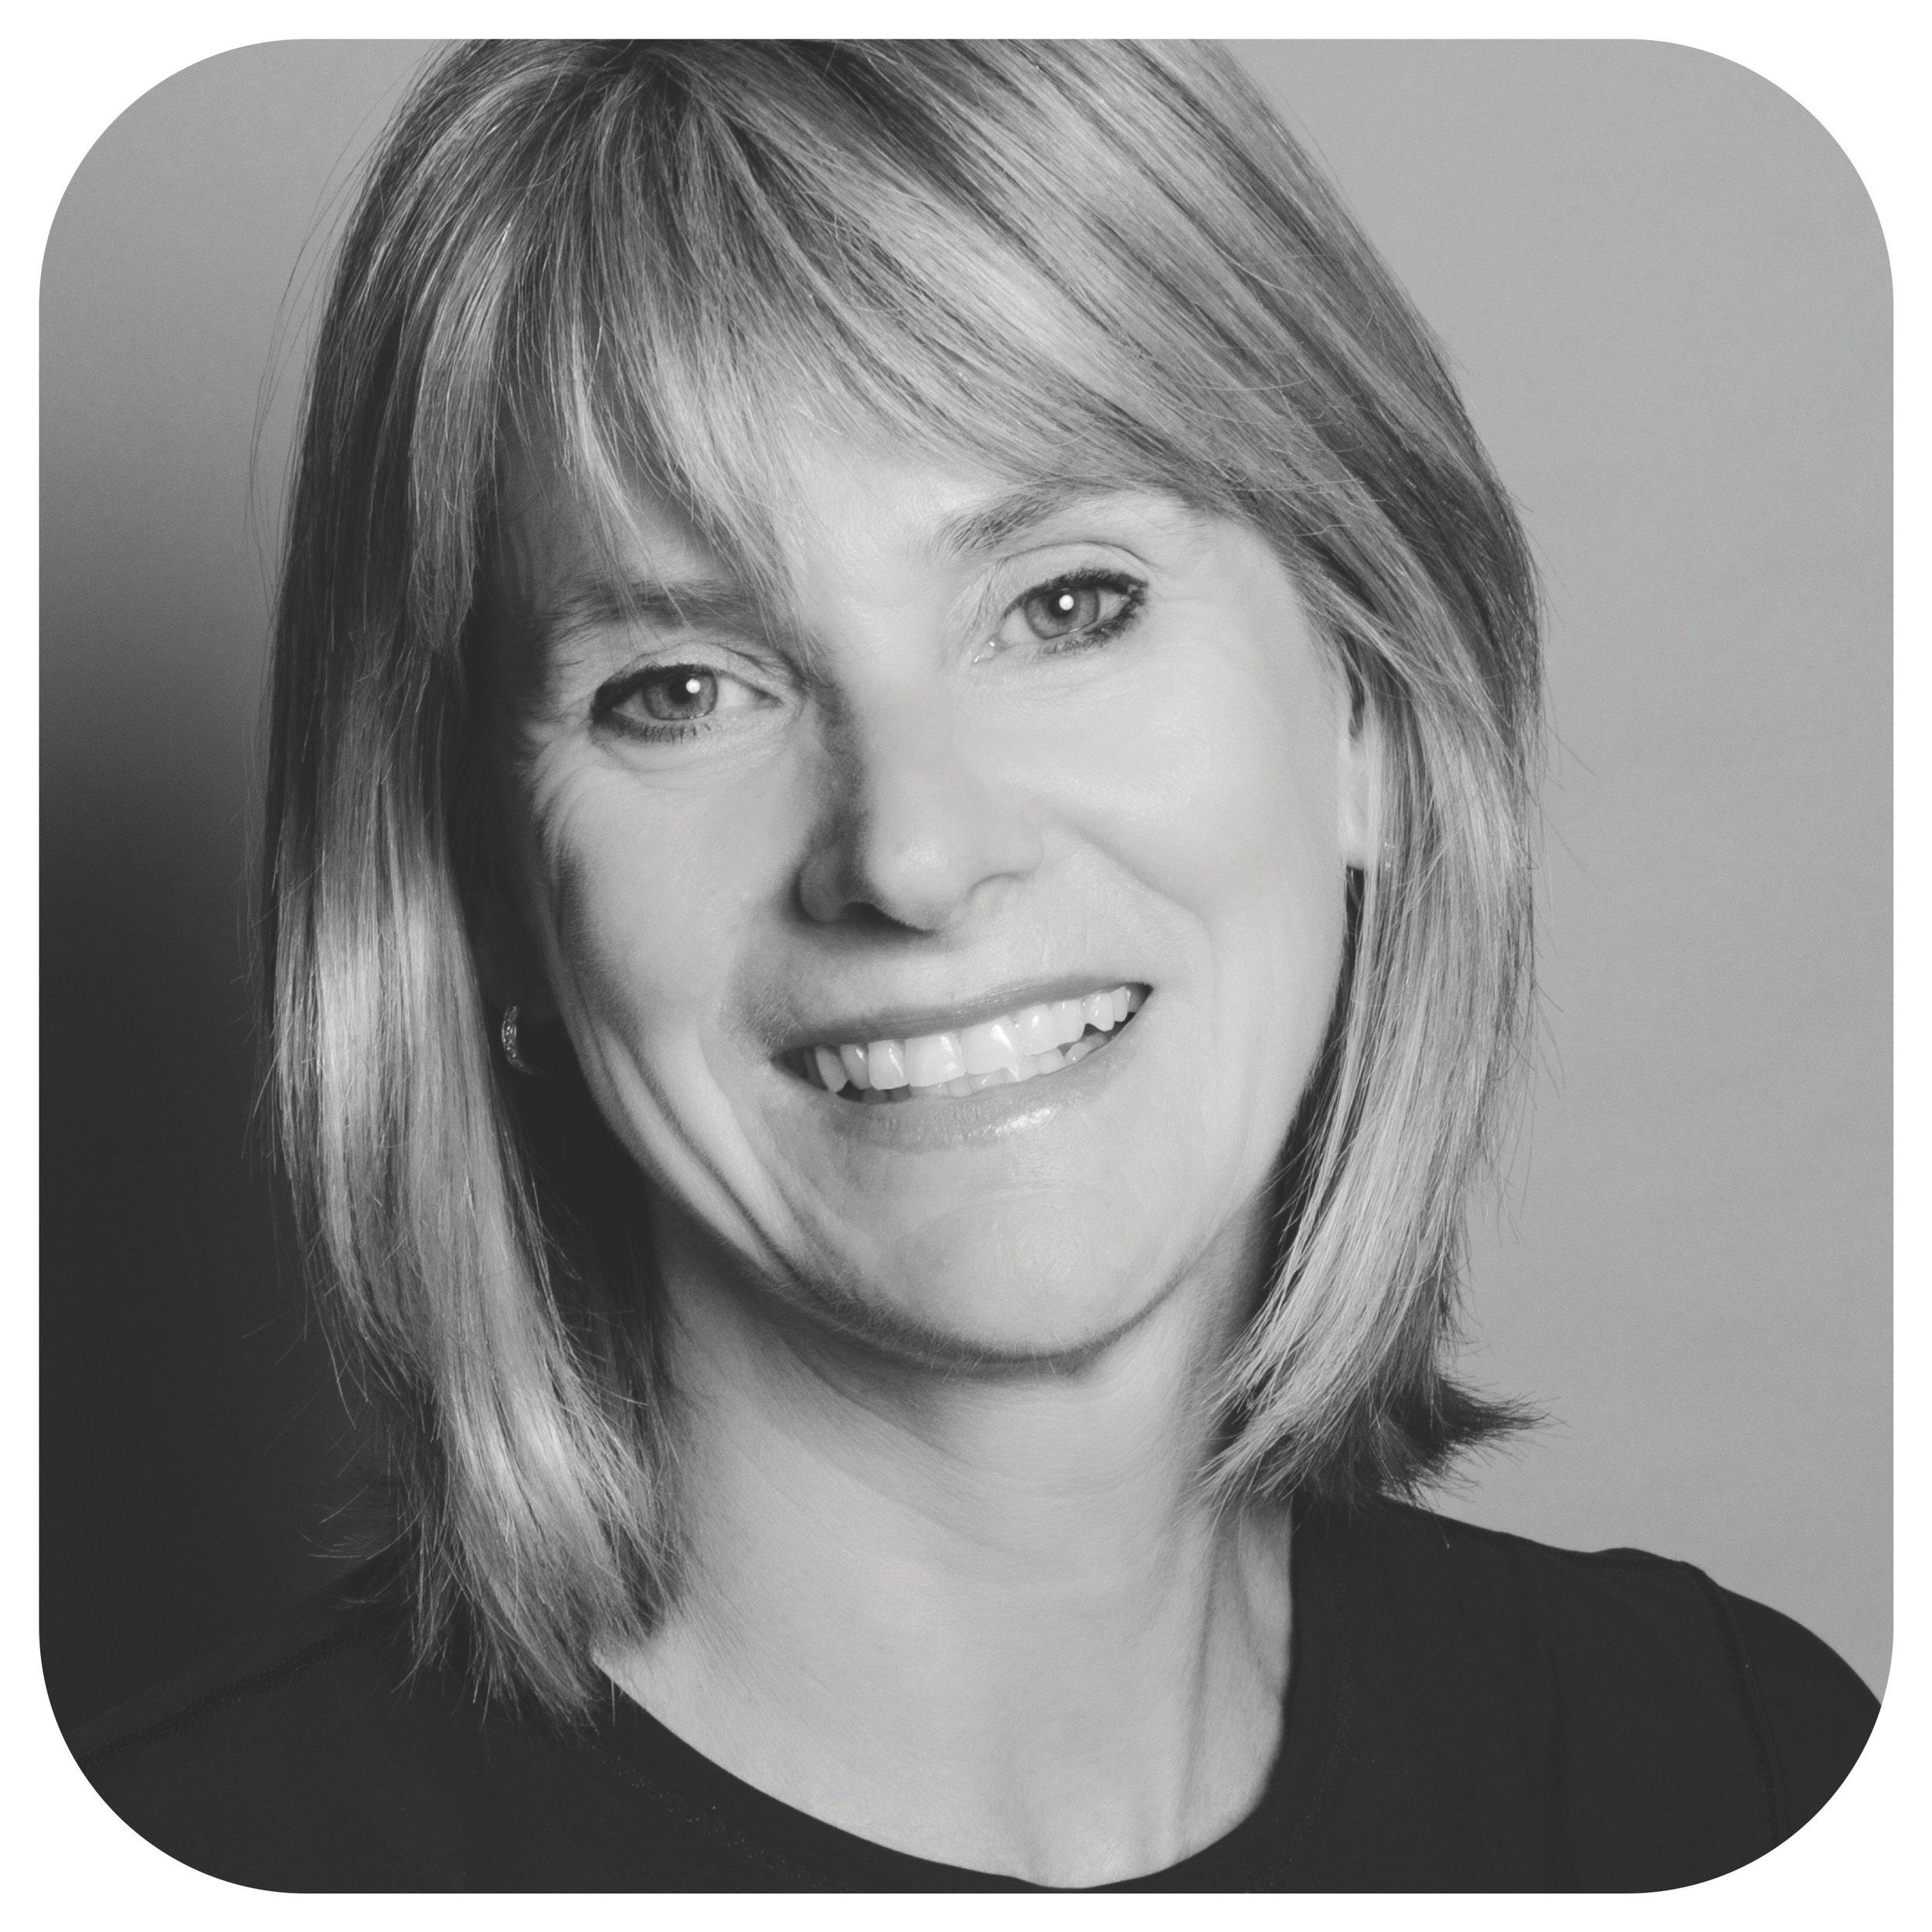 Healthy Living Now - Liz Grant - Contributors - Meet Our Team.jpg